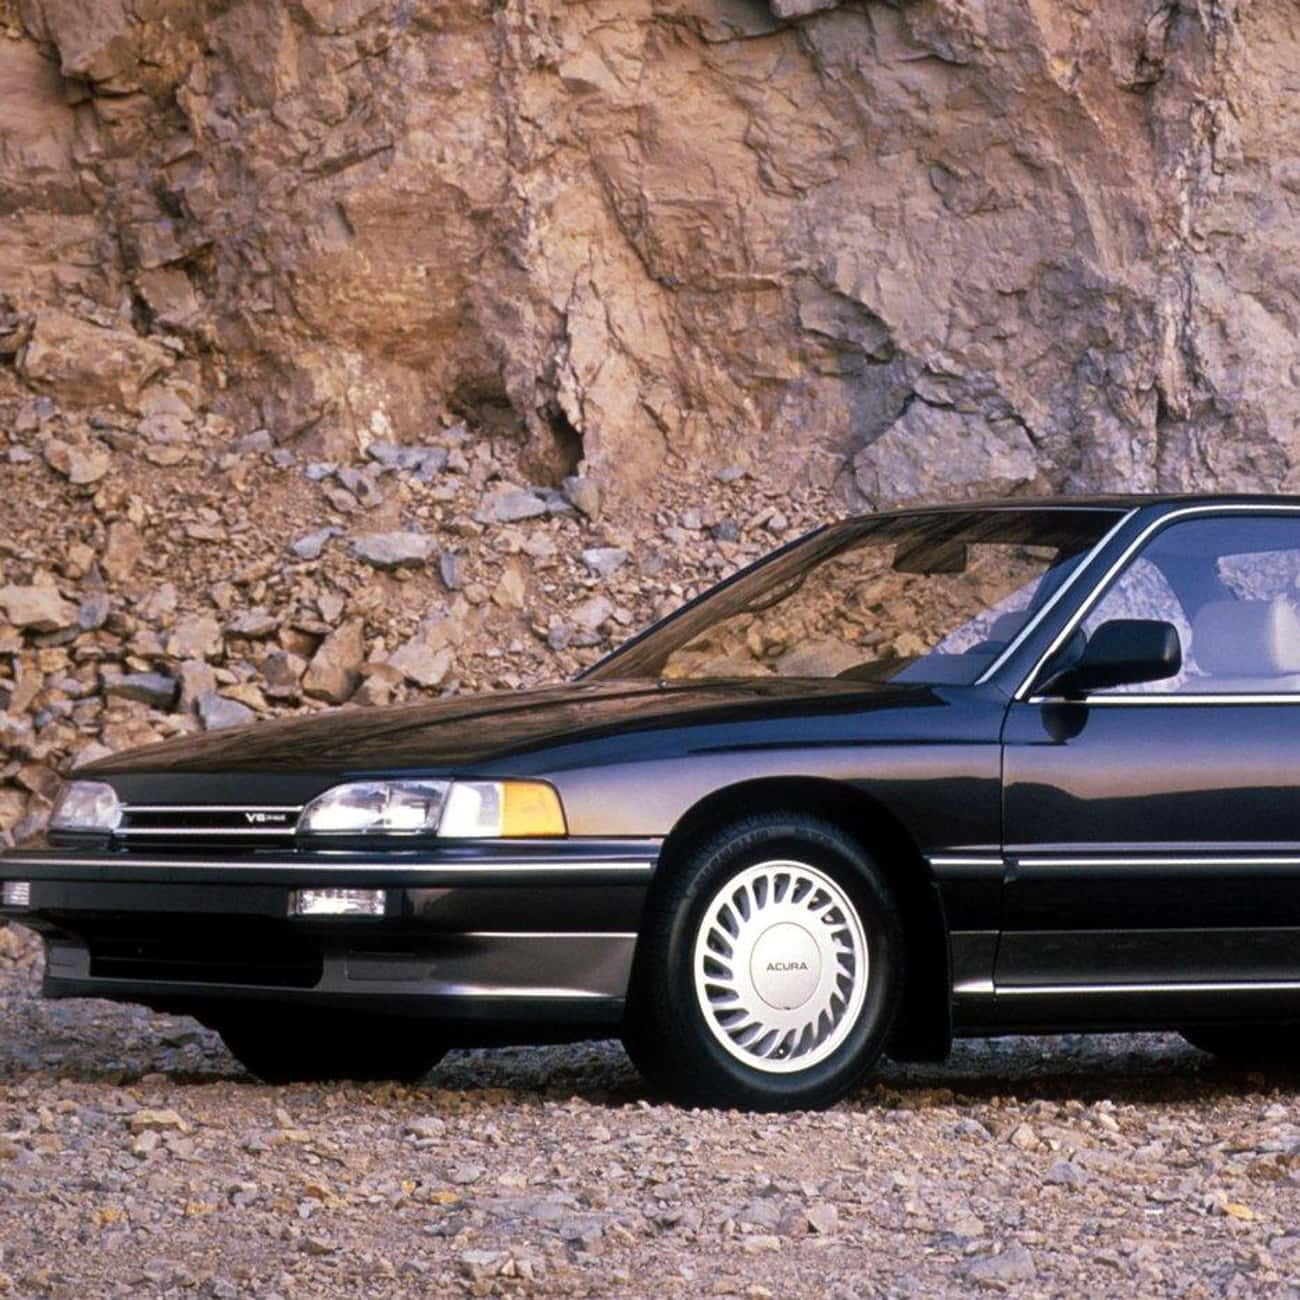 1987 Acura Legend Coupe